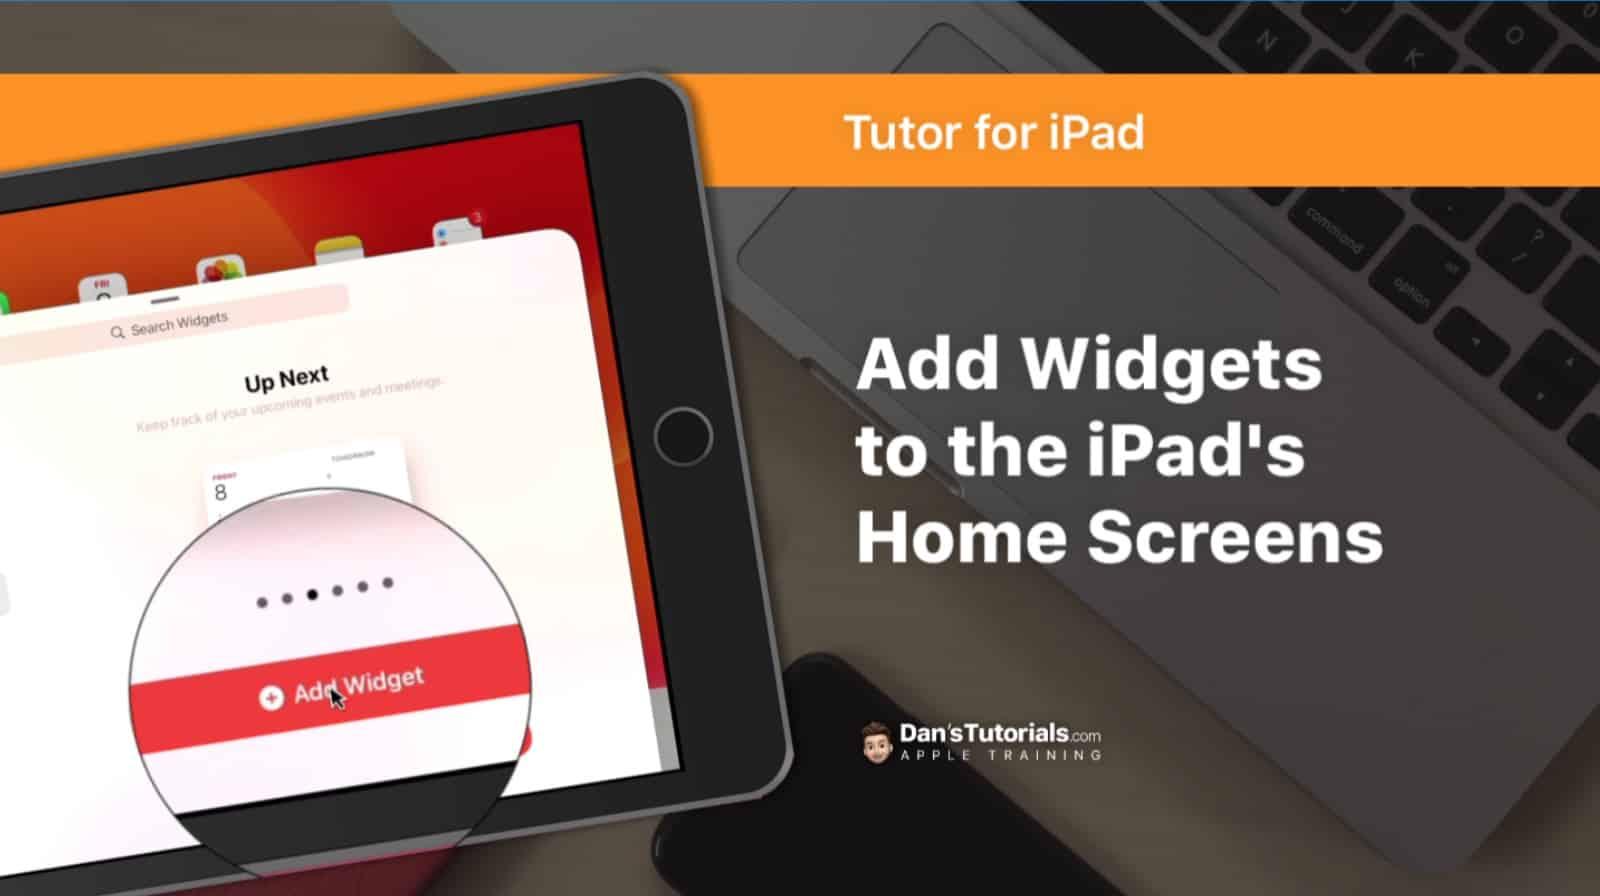 Add Widgets to the iPad's Home Screens